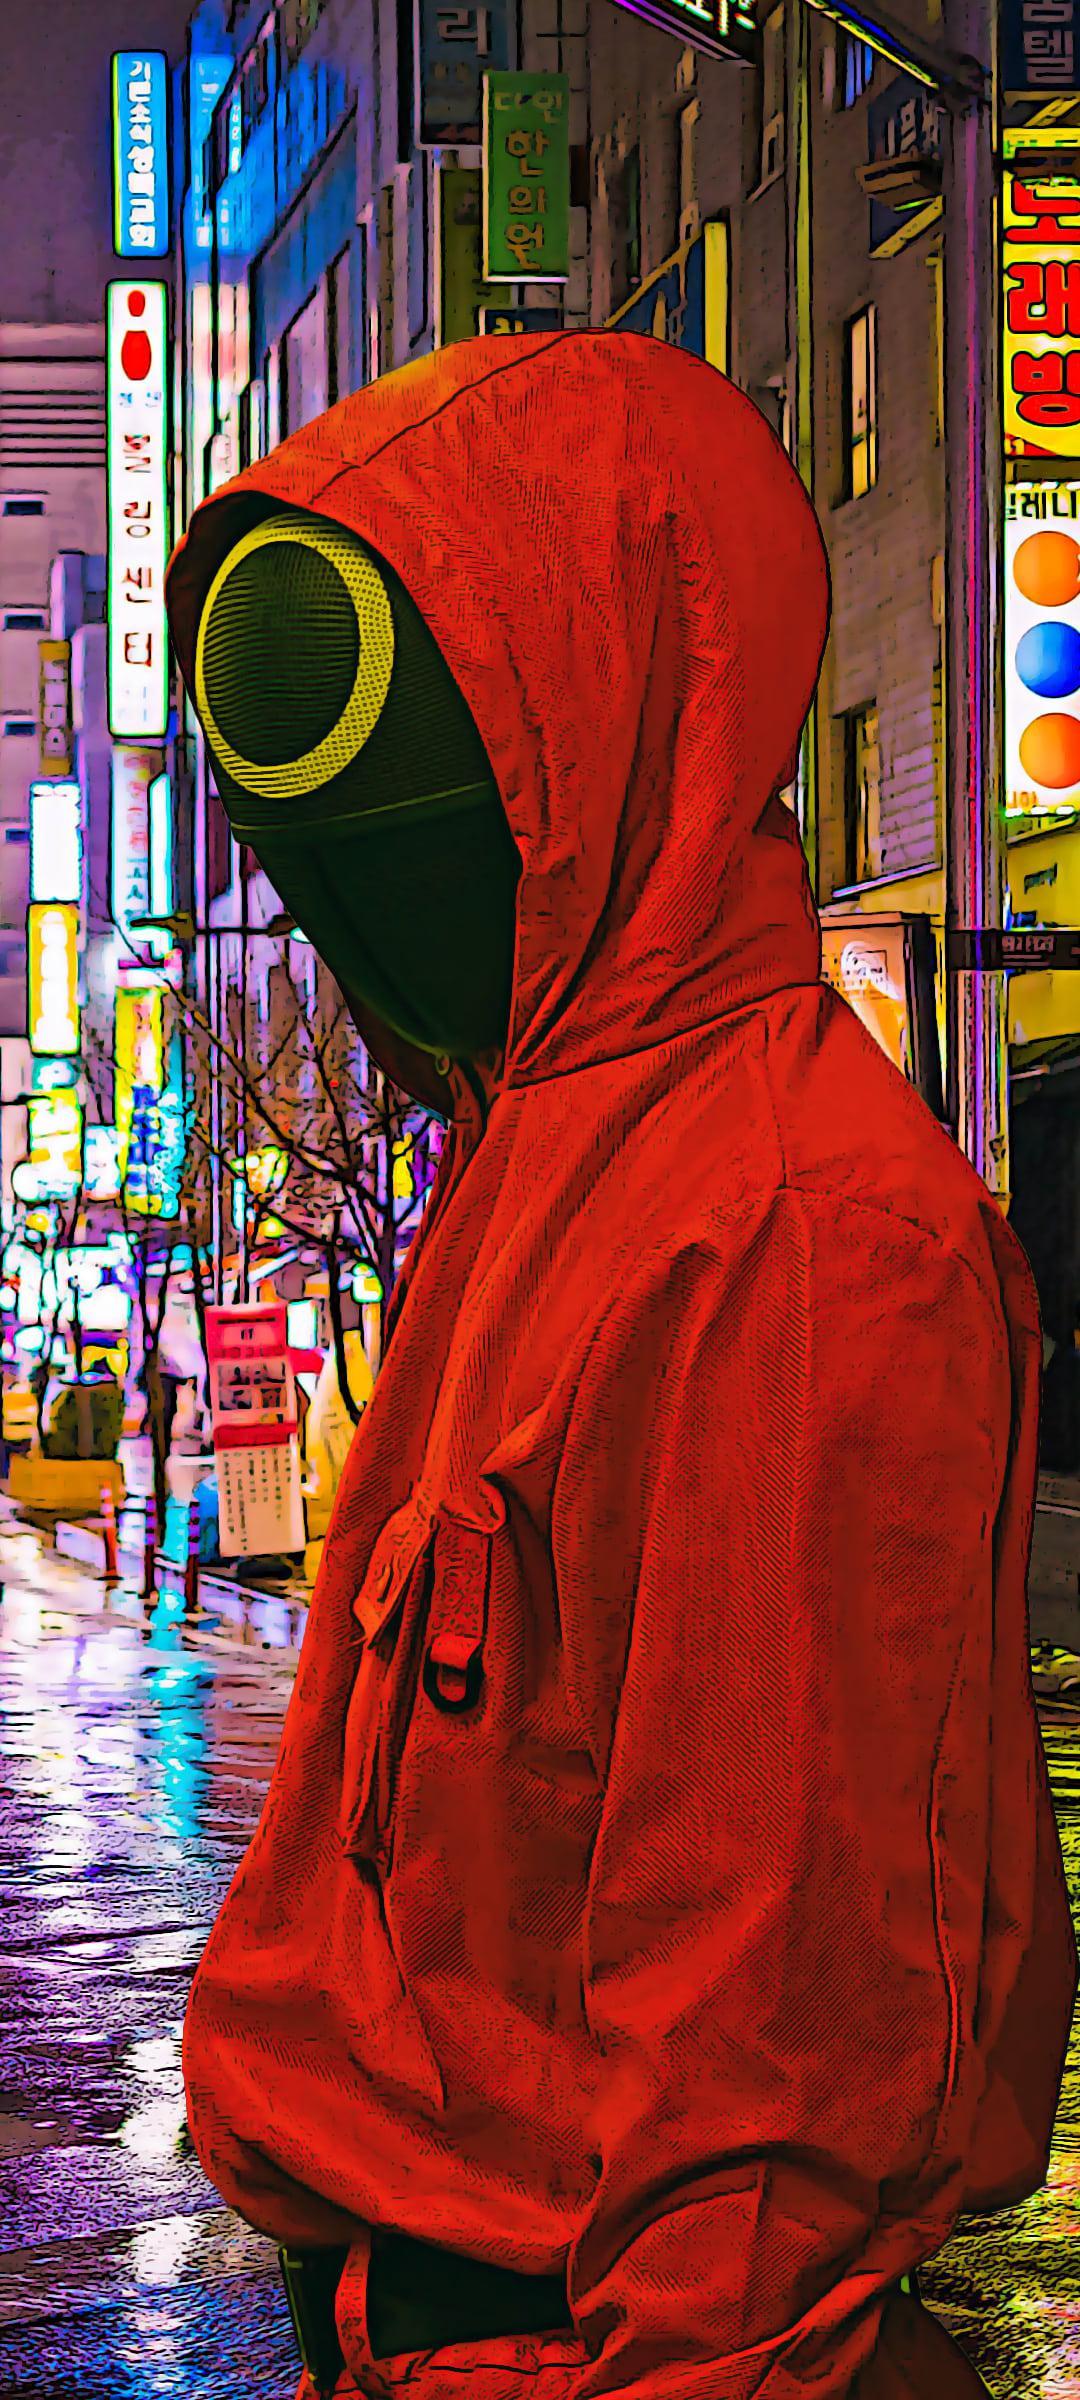 عکس زمینه شخصیت قرمز سریال بازی مرکب Squid Game پس زمینه